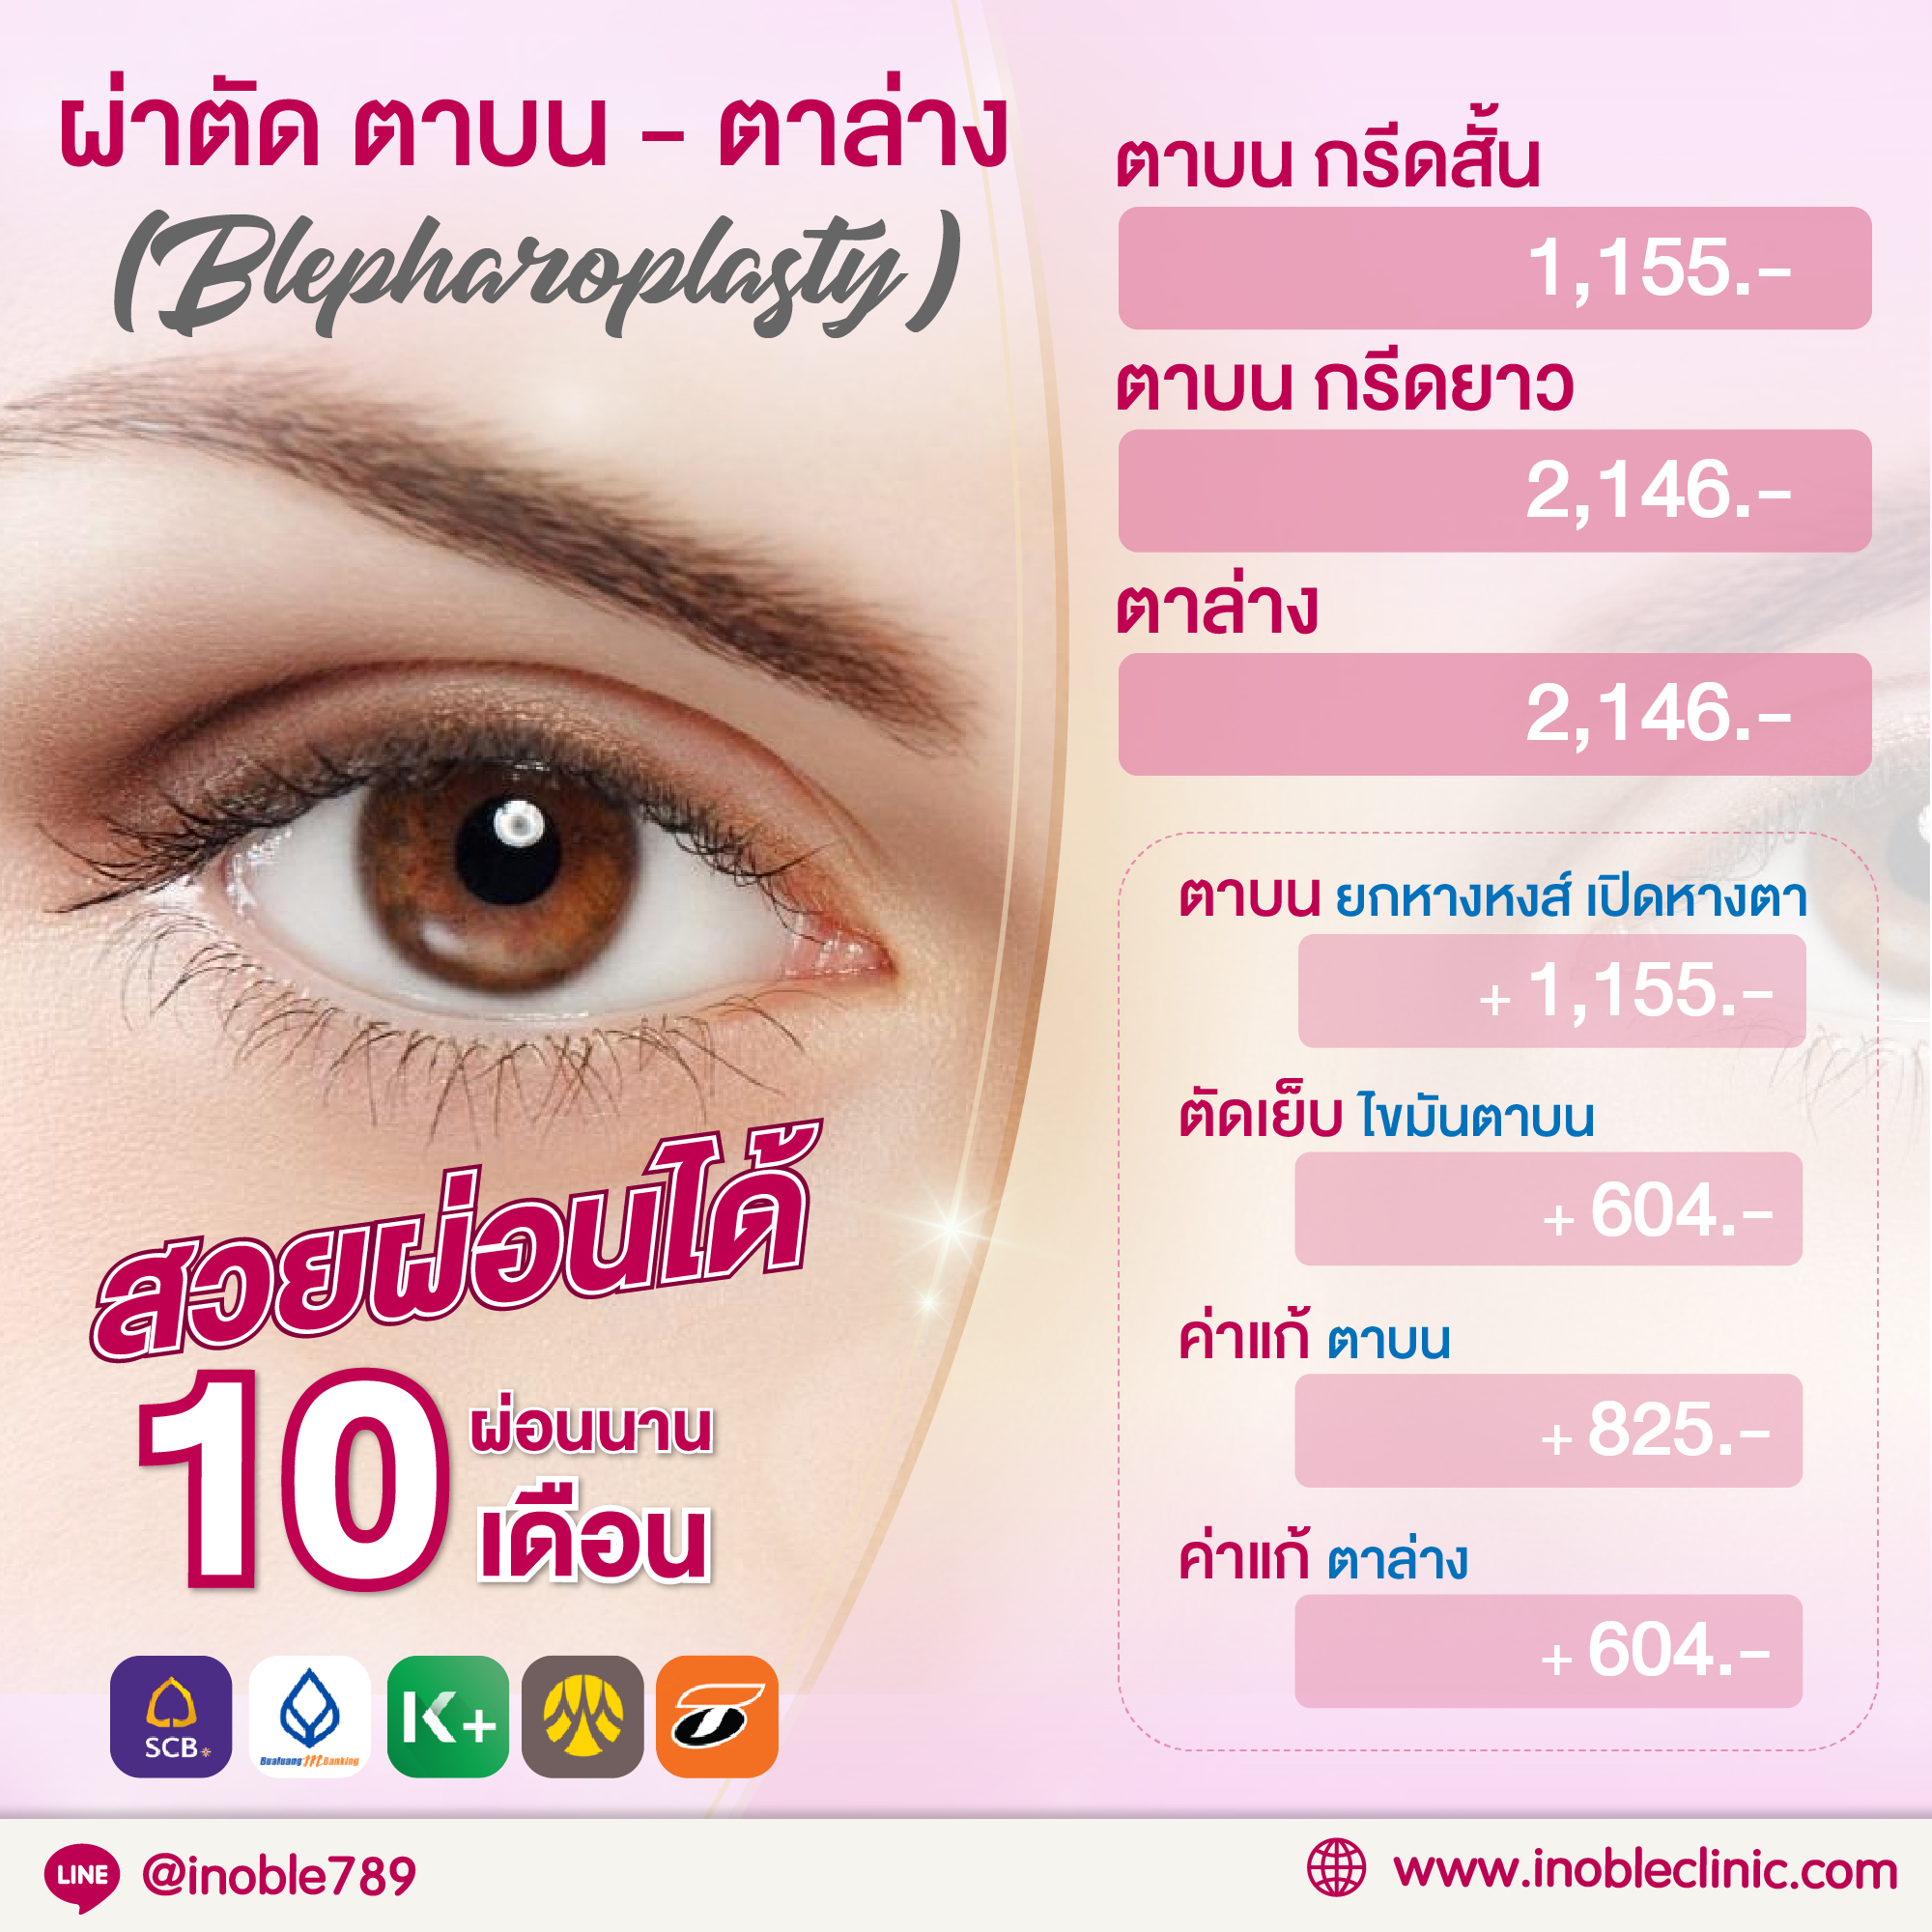 iNoble - ผ่าตัดตา